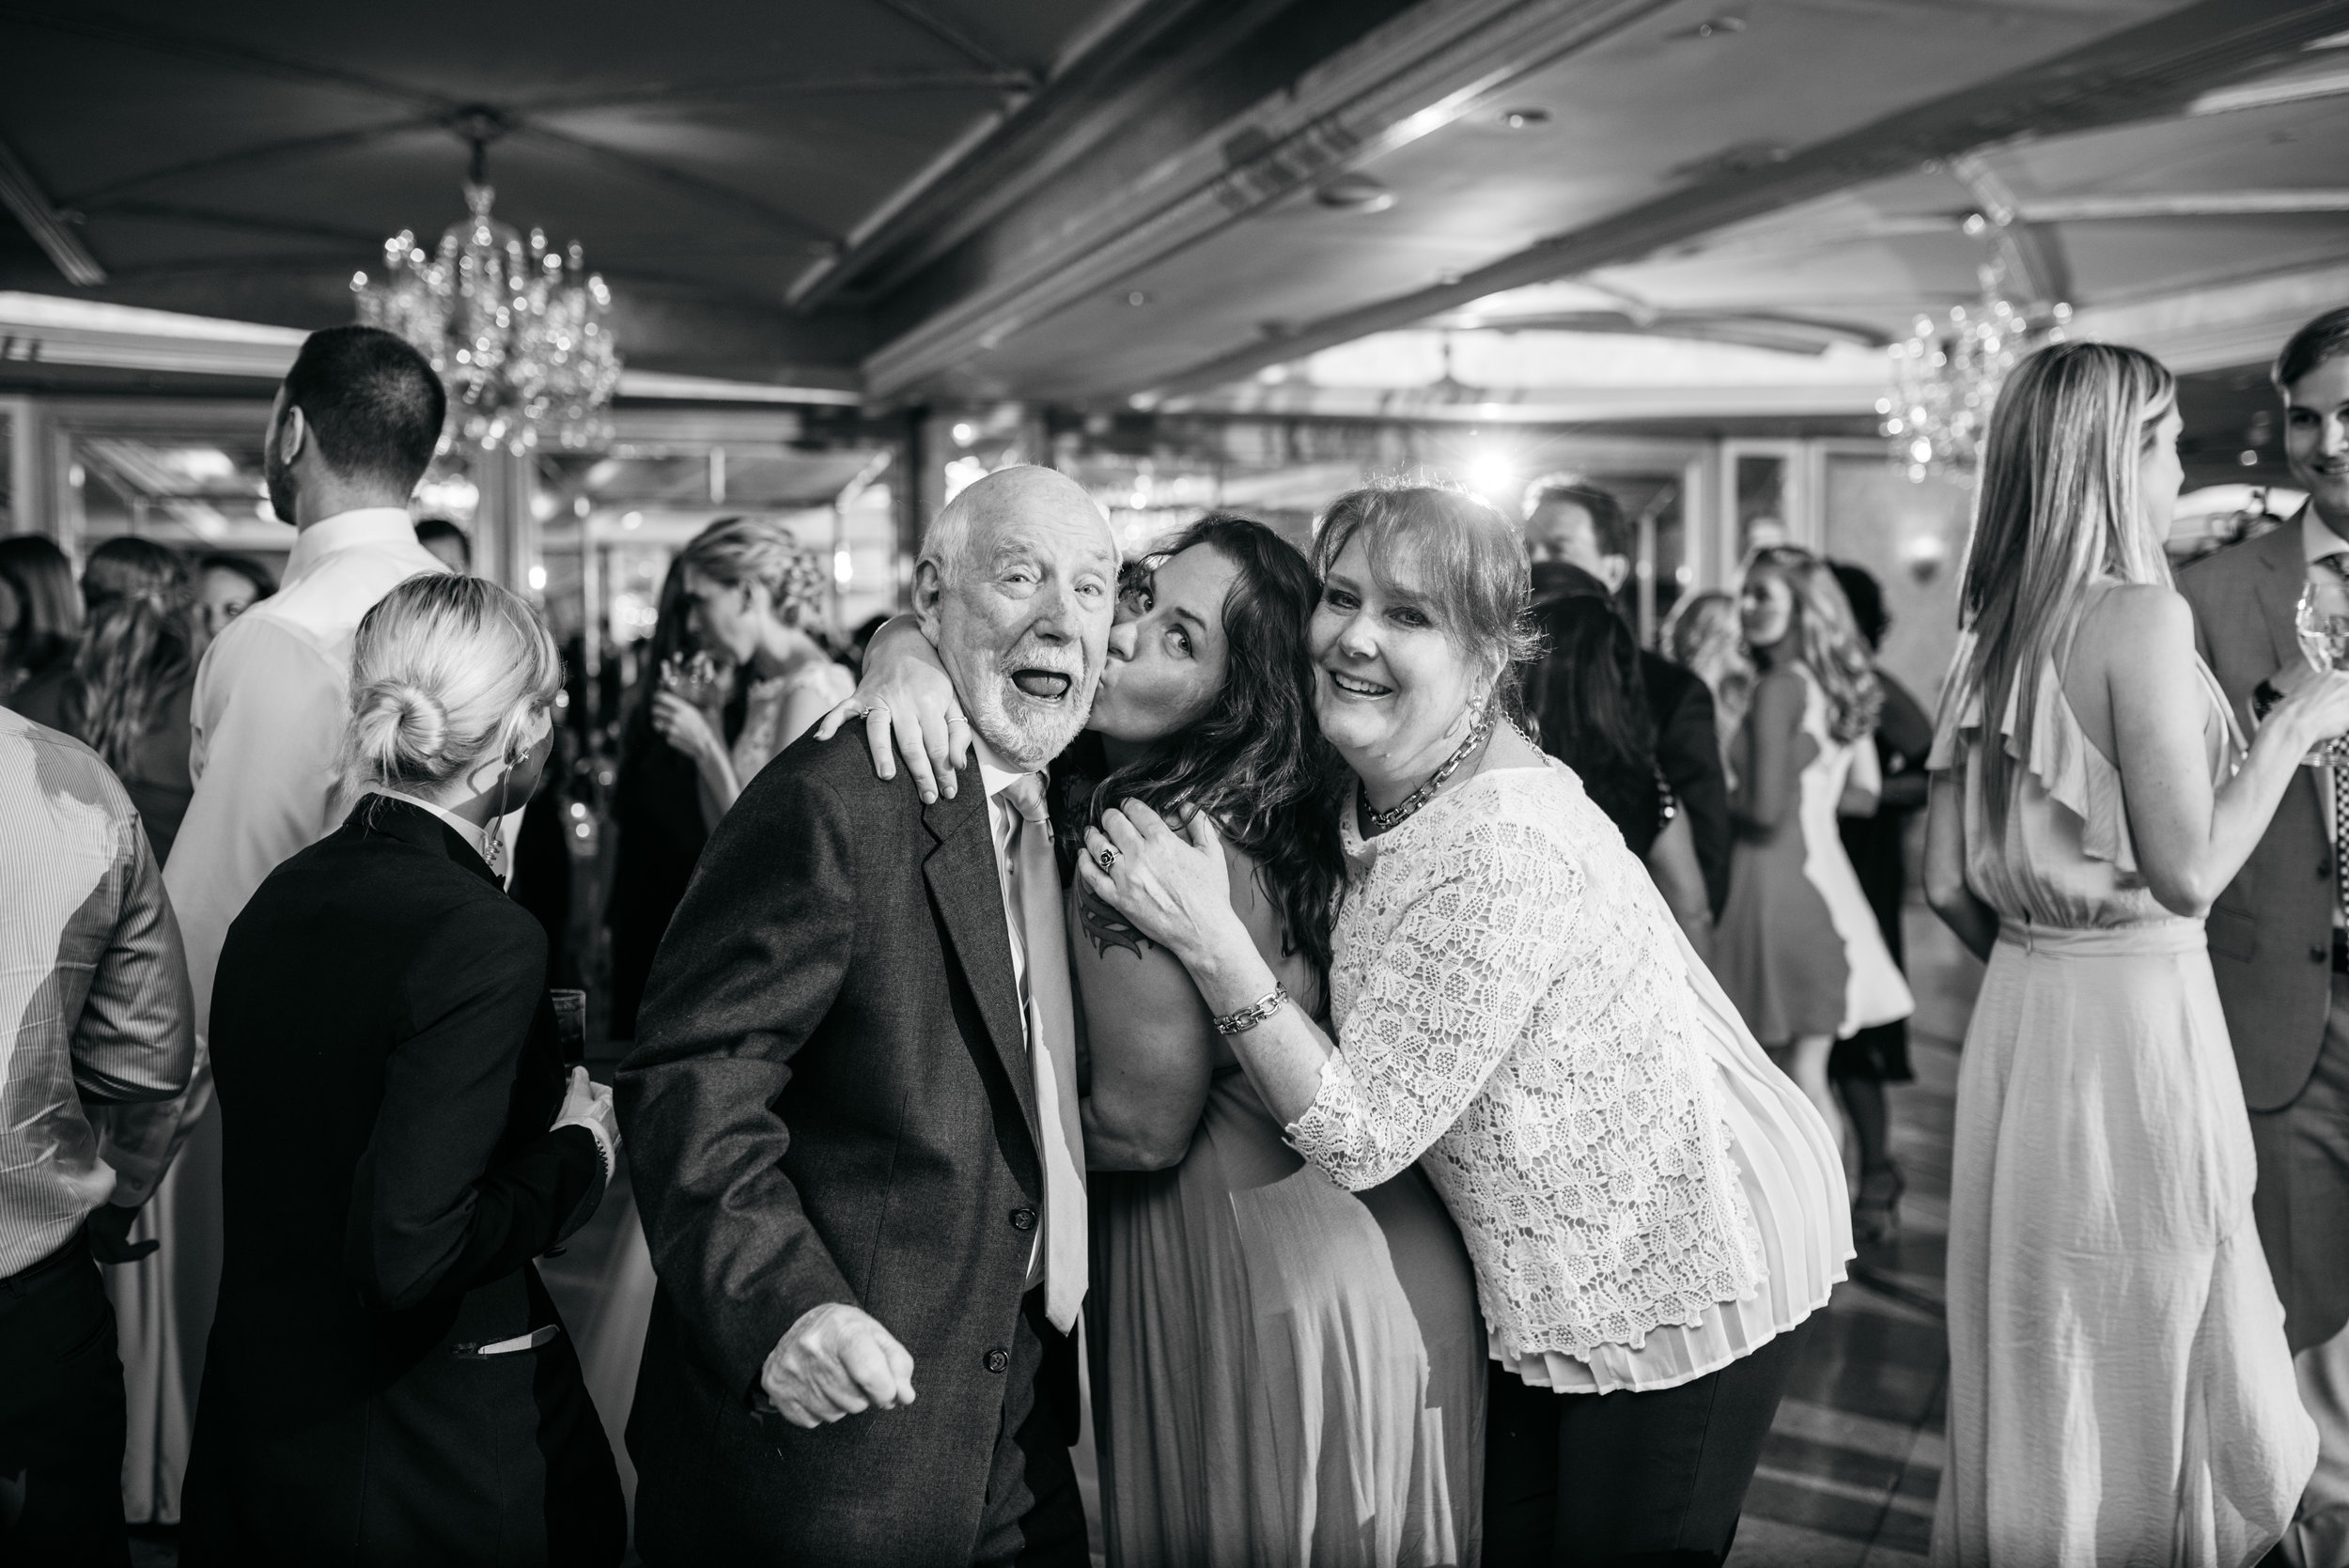 WeddingPhotos | NJPhotographer | Highlights-12-3.jpg